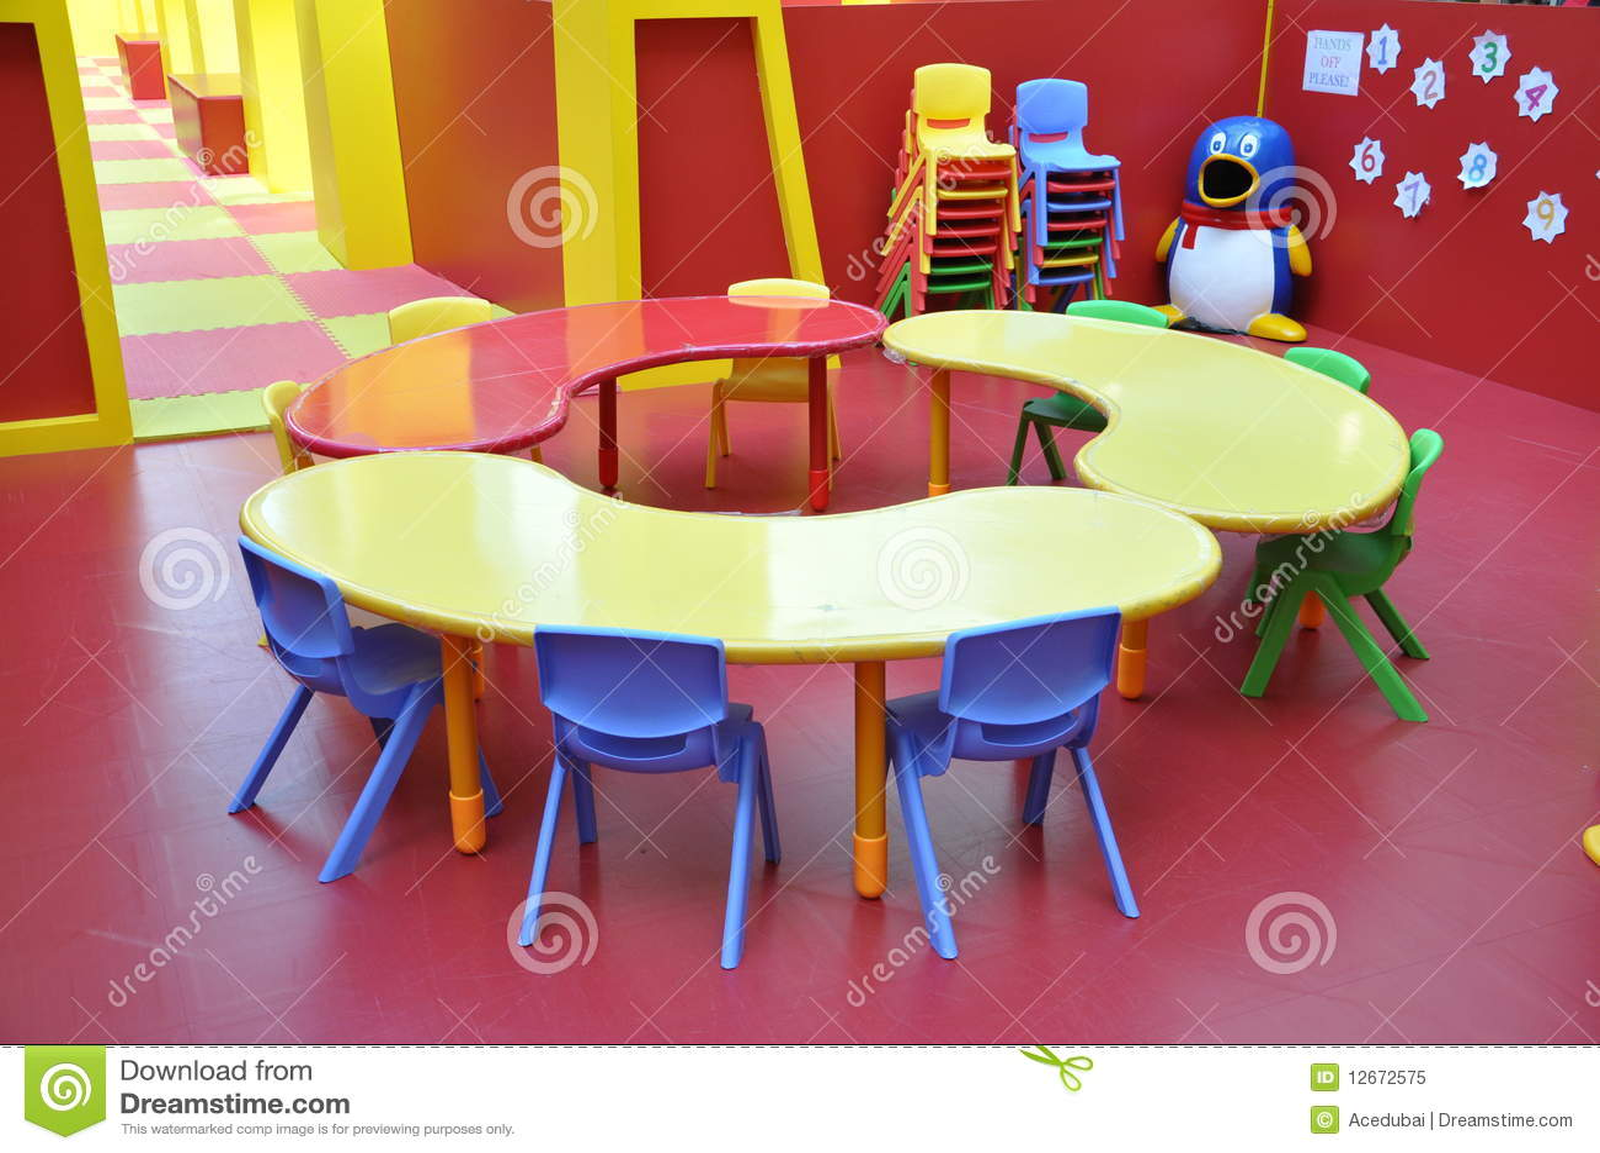 Kindergarten Childrens Play Area Table Stock Image Image